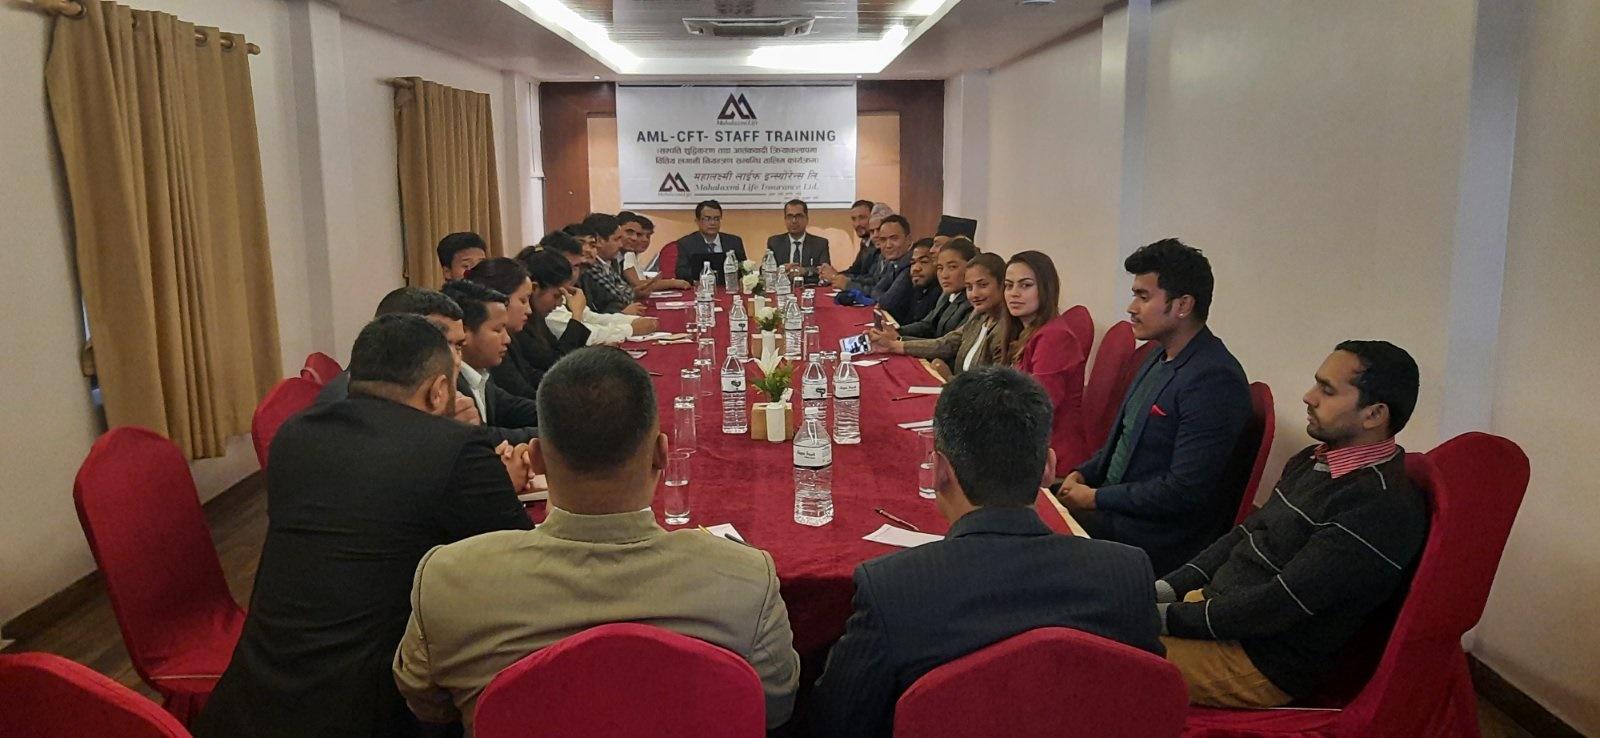 Mahalaxmi Life Insurance Ltd. conducted AML-CFT Training in Pokhara